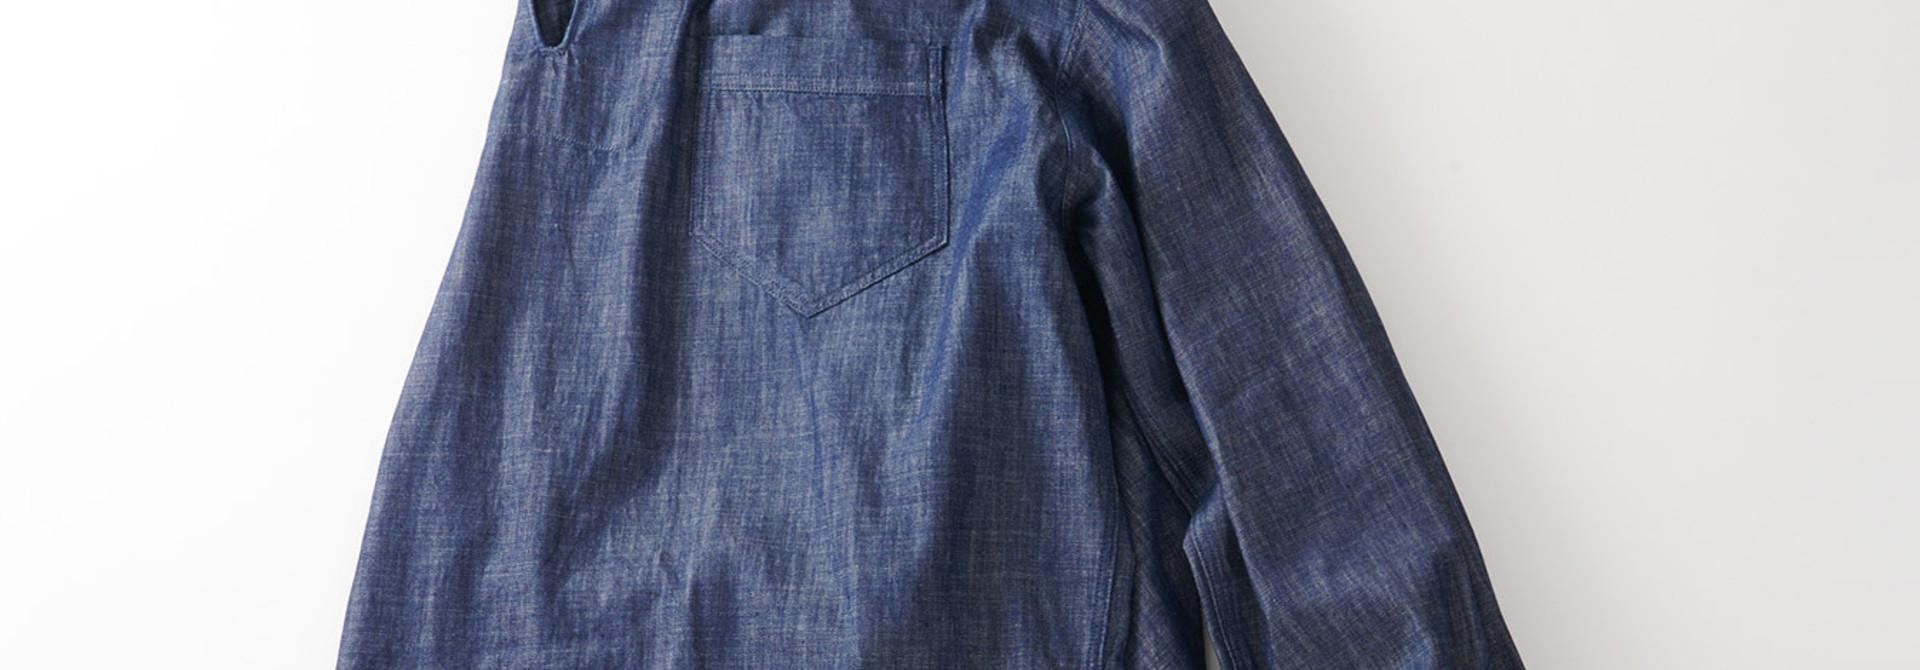 WH Goma Denim Umahiko Pullover Shirt